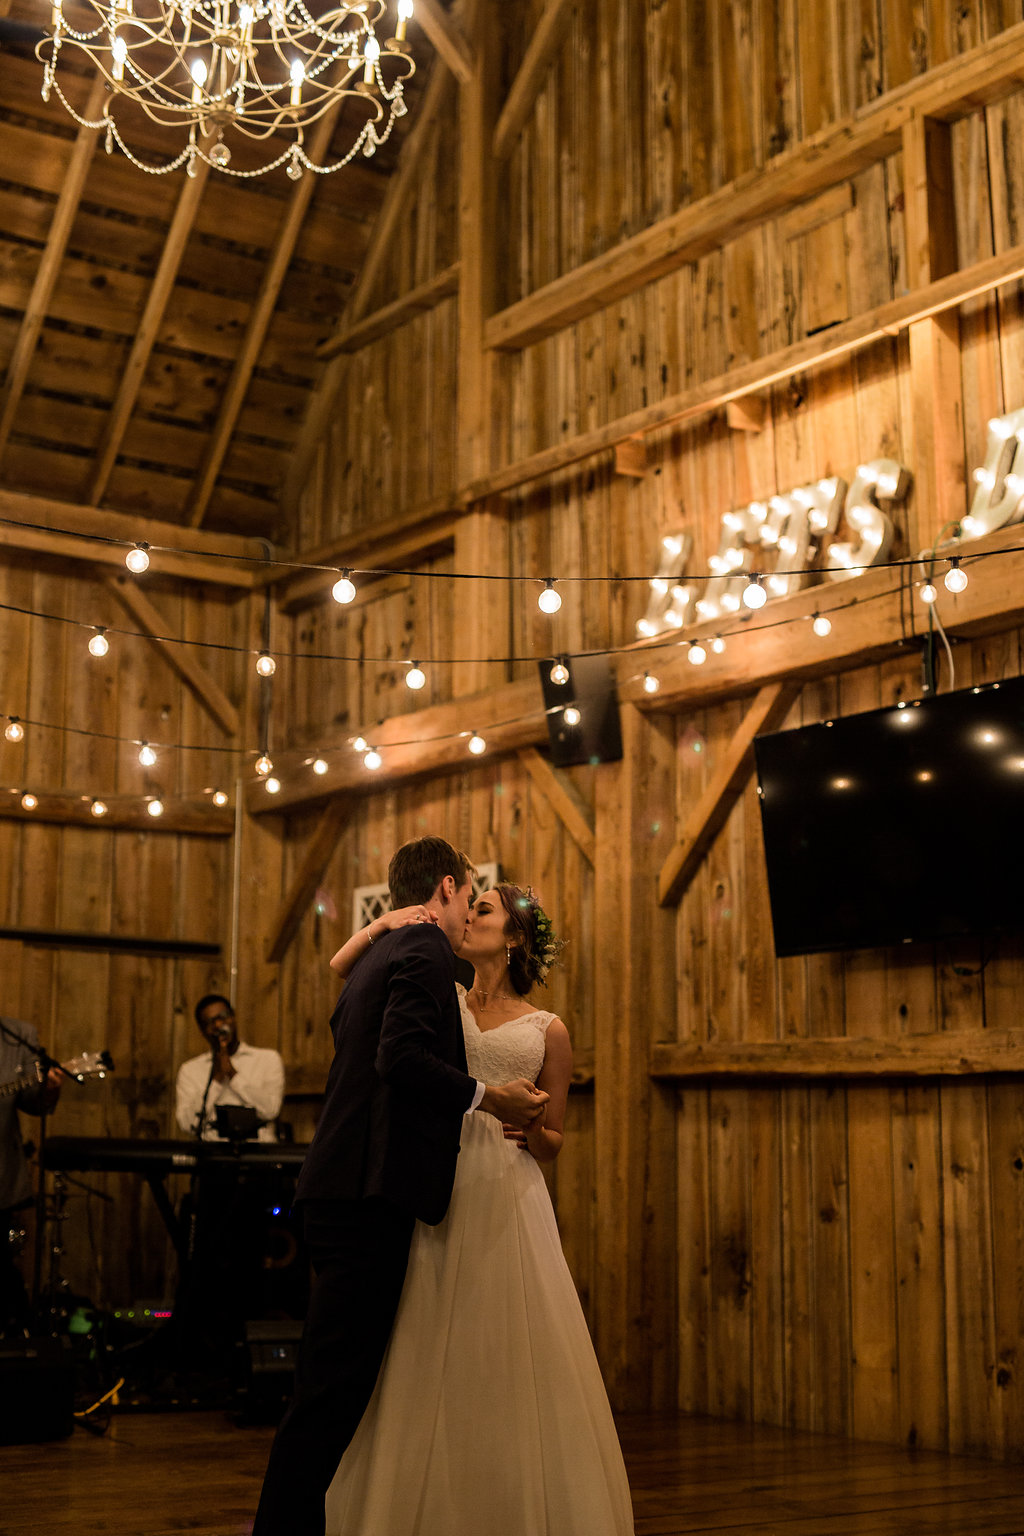 Sonshine_barn_northern_michigan_wedding_-88.jpg